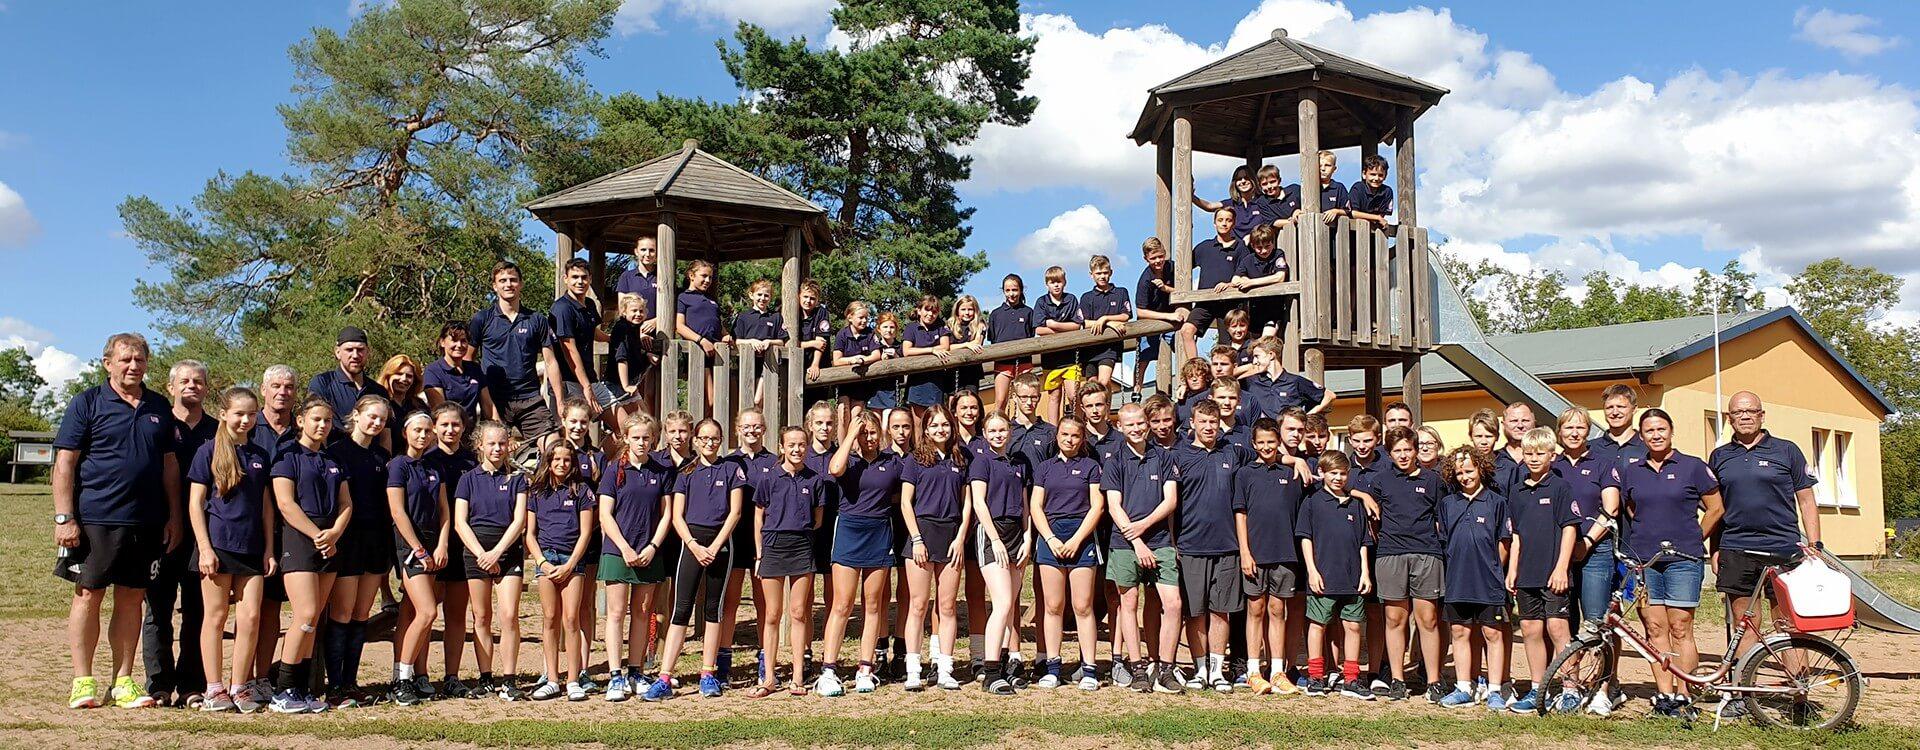 Sommercamp Straußberg 2020